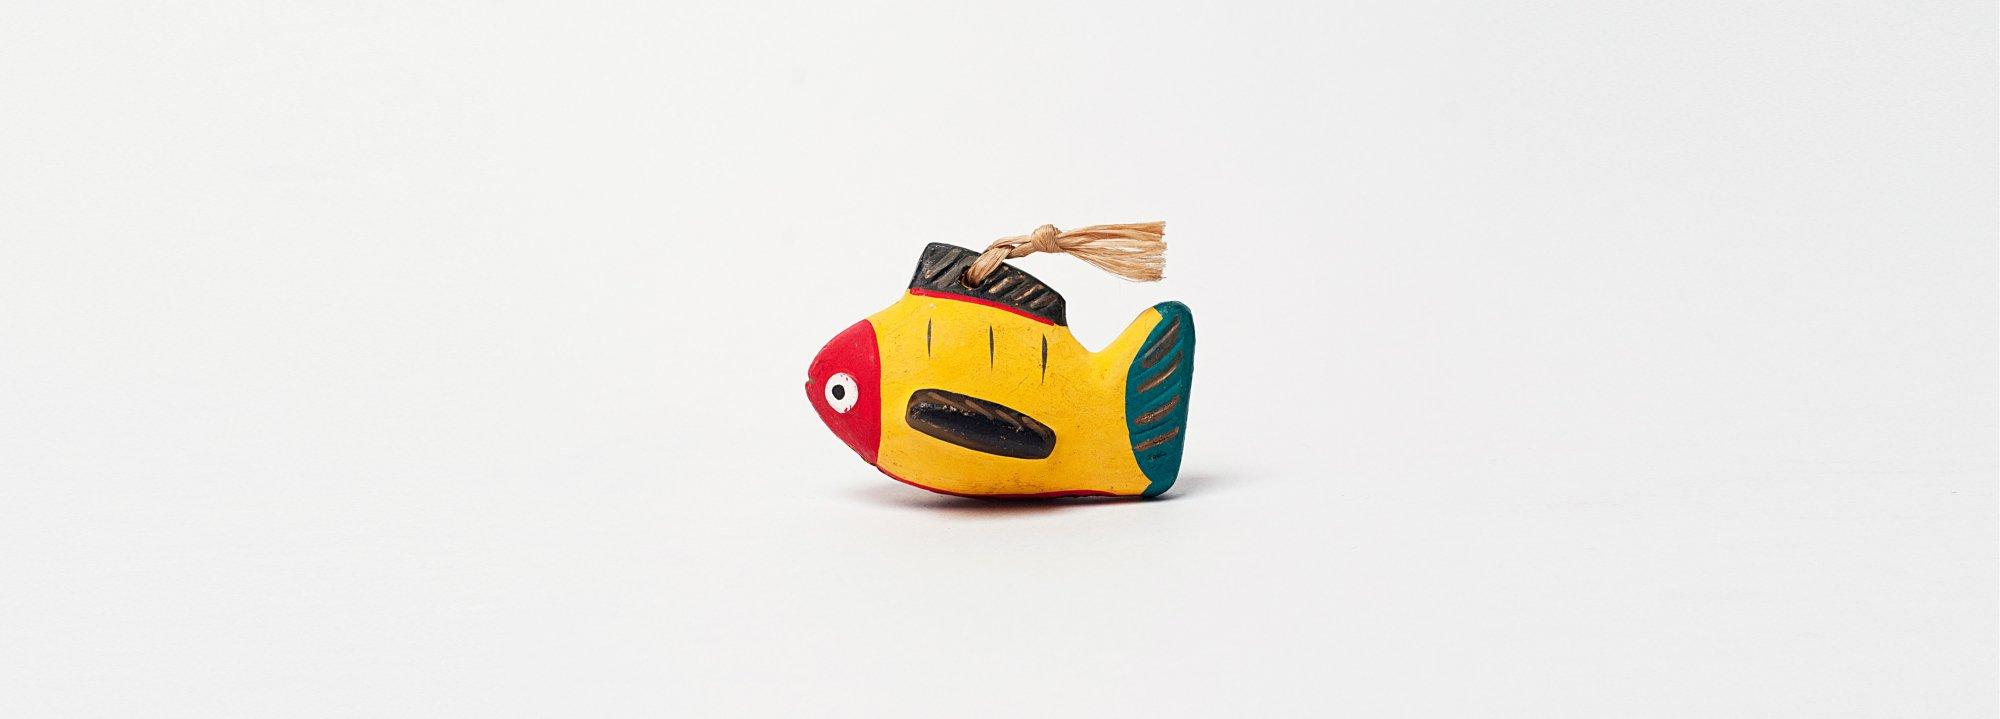 Vintage Object : Dorin Kibuna